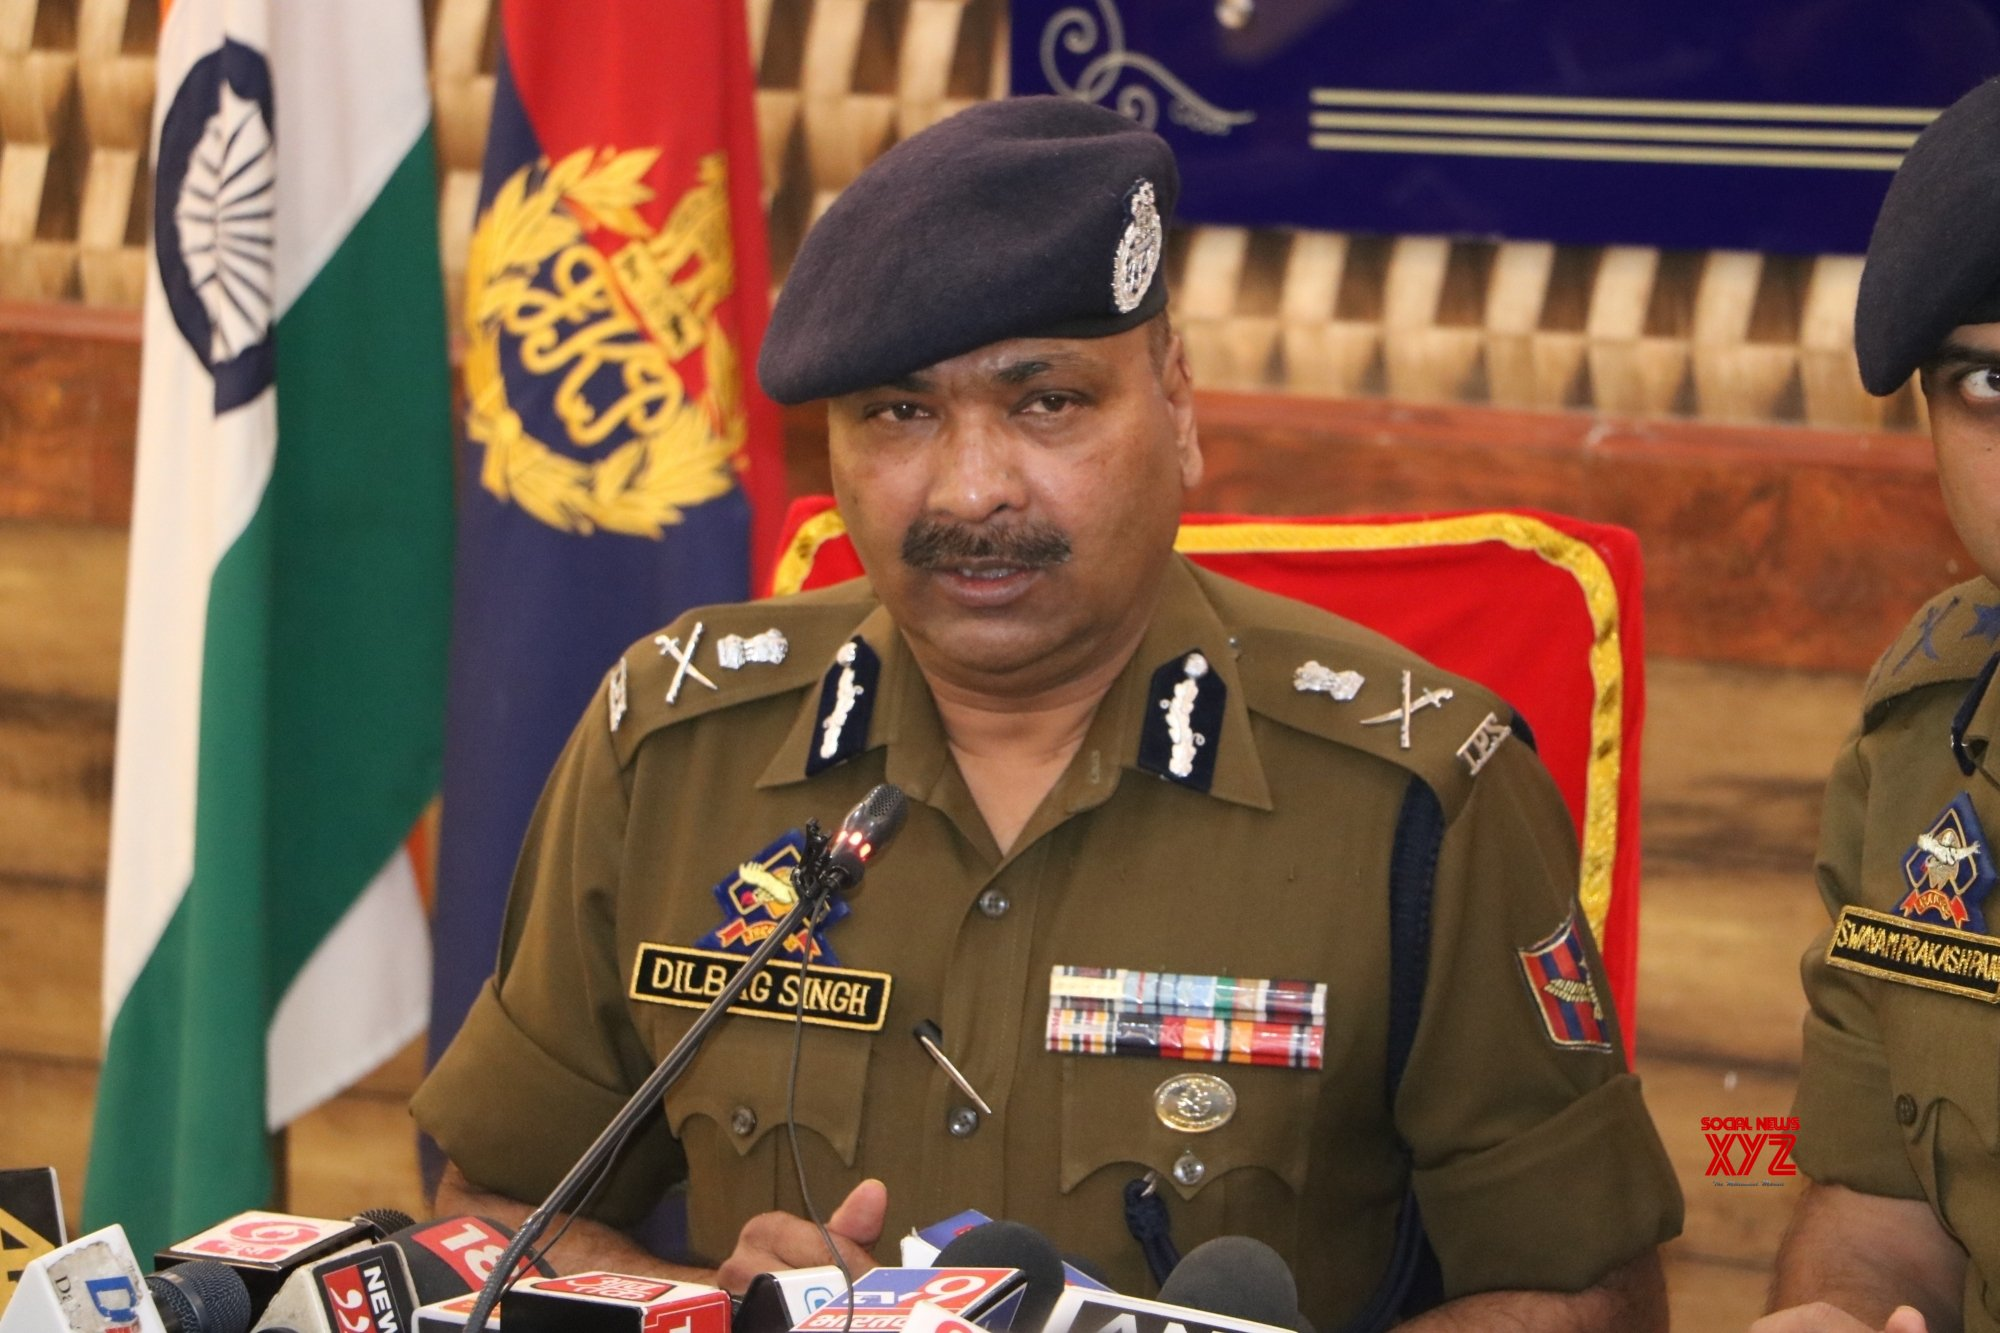 48 terrorists killed in June: J&K DGP